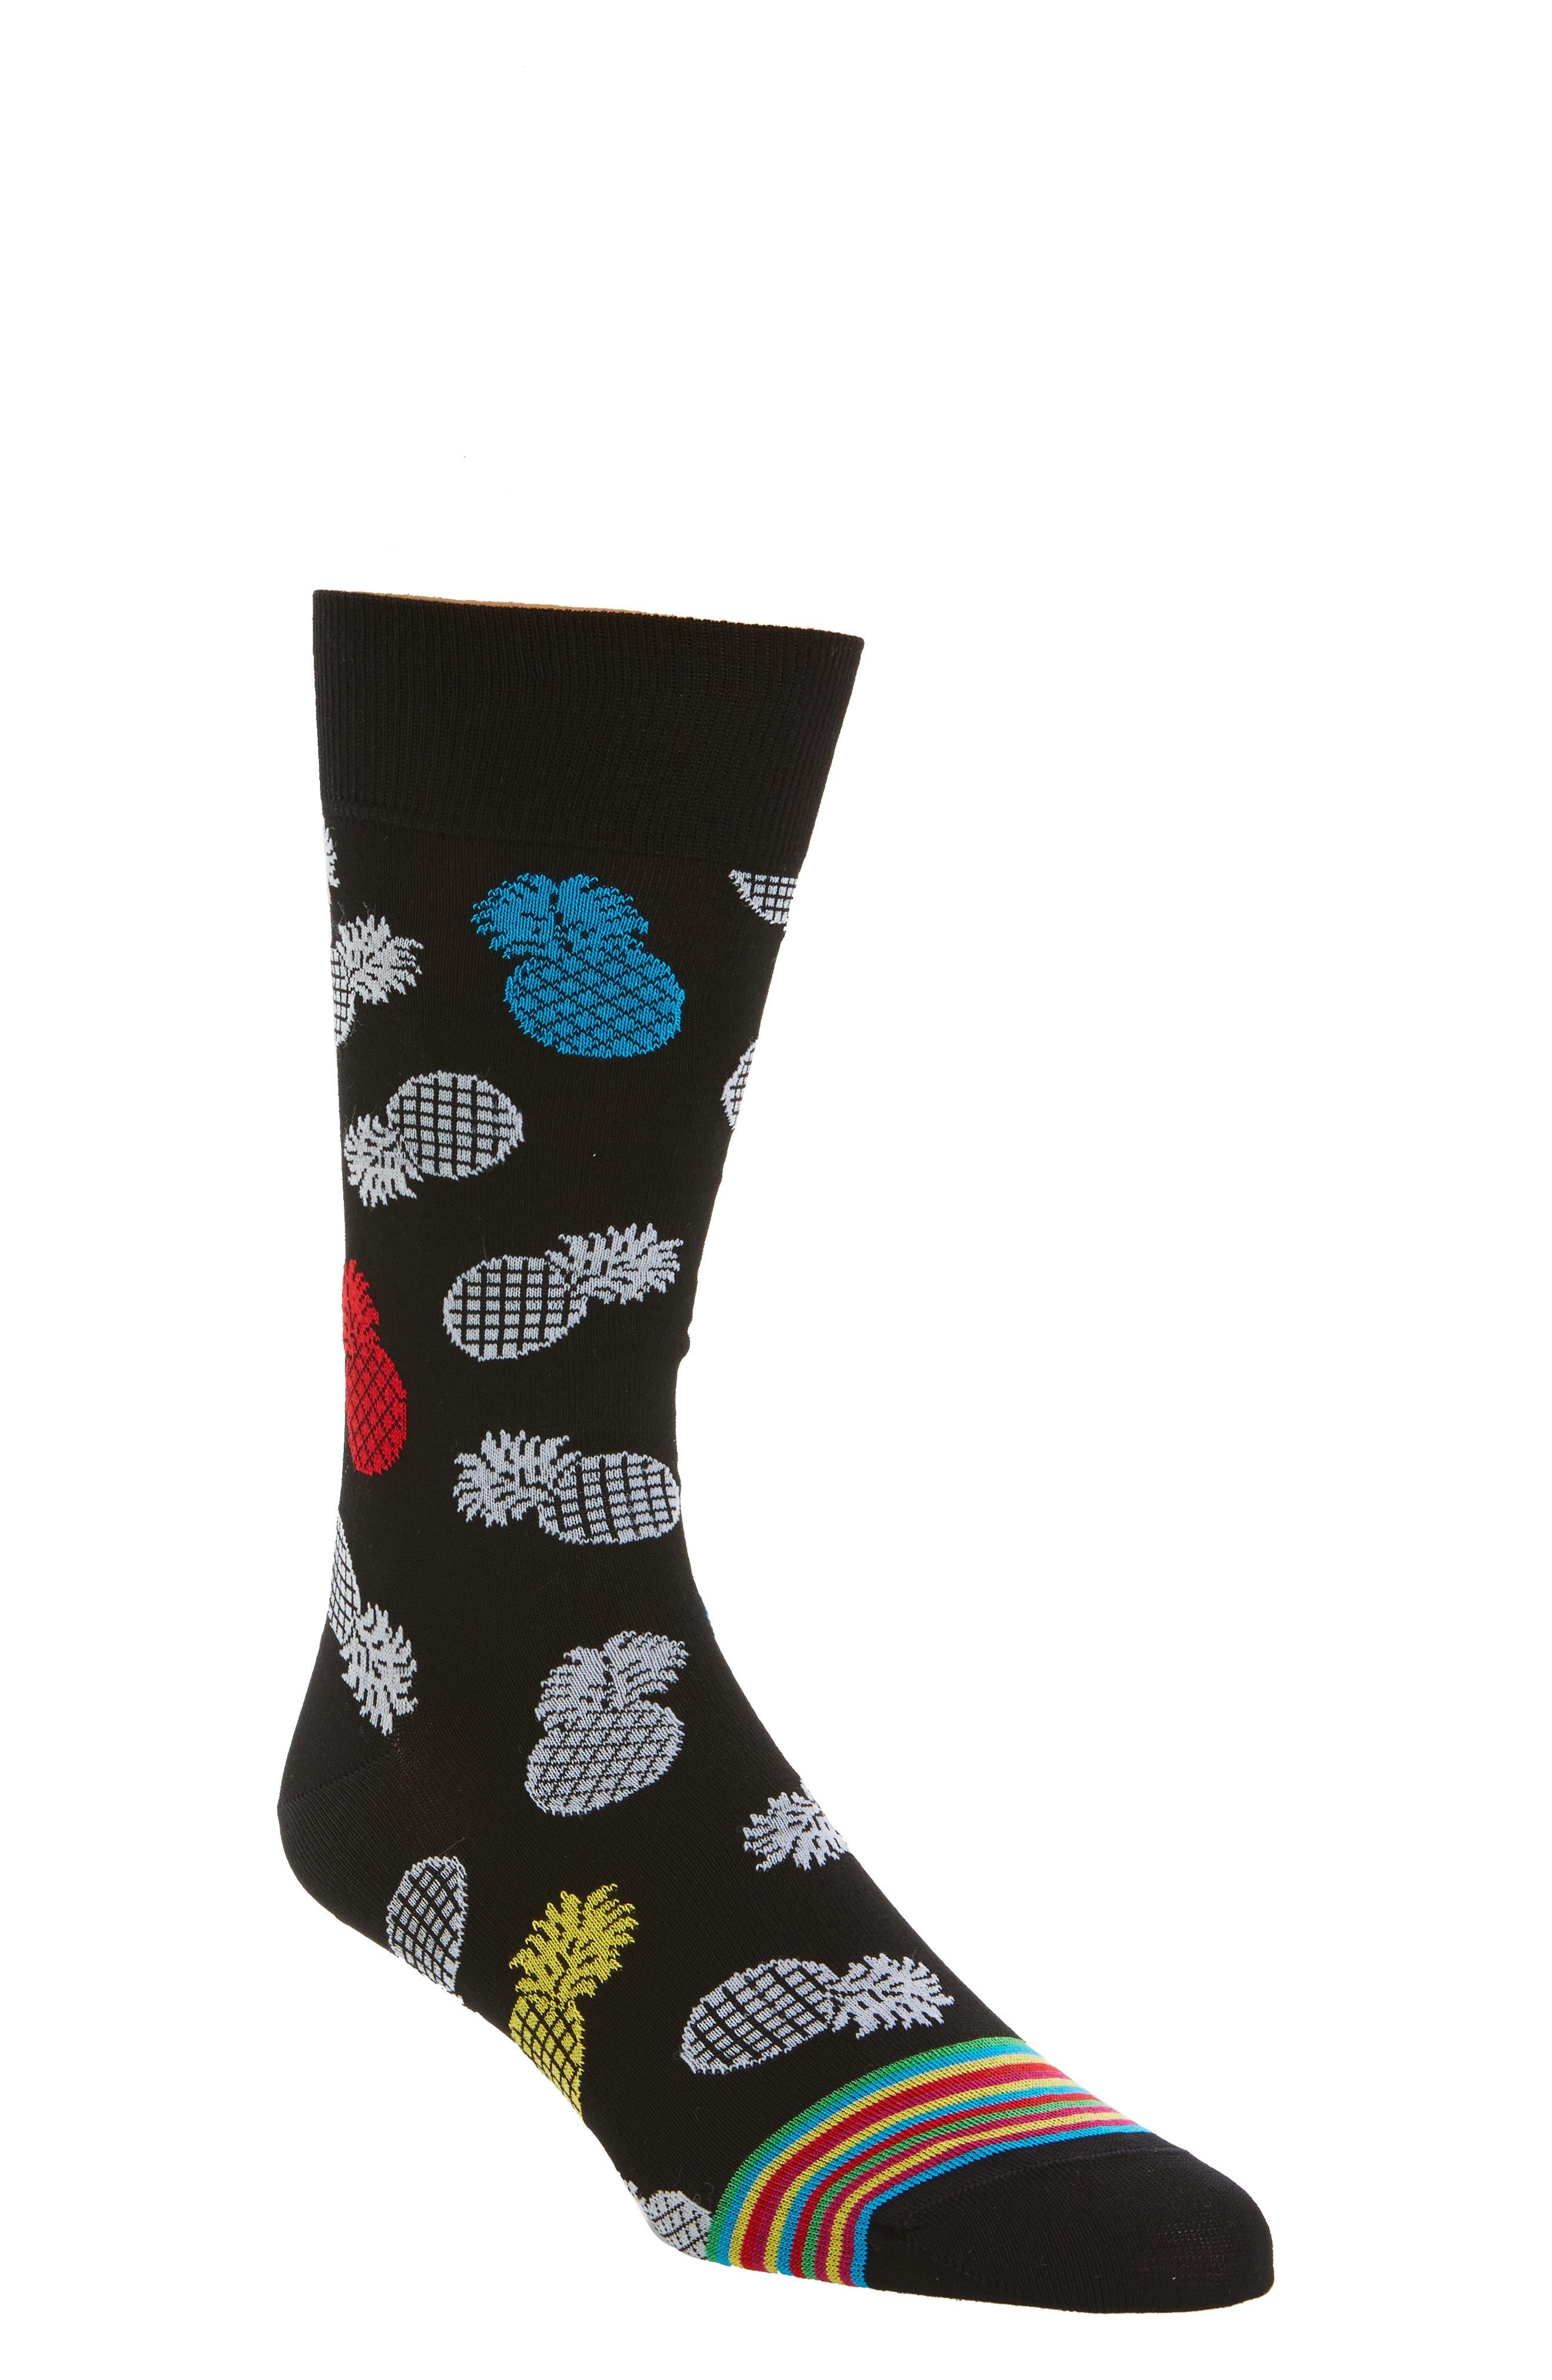 Pineapple Socks,                             Main thumbnail 1, color,                             001